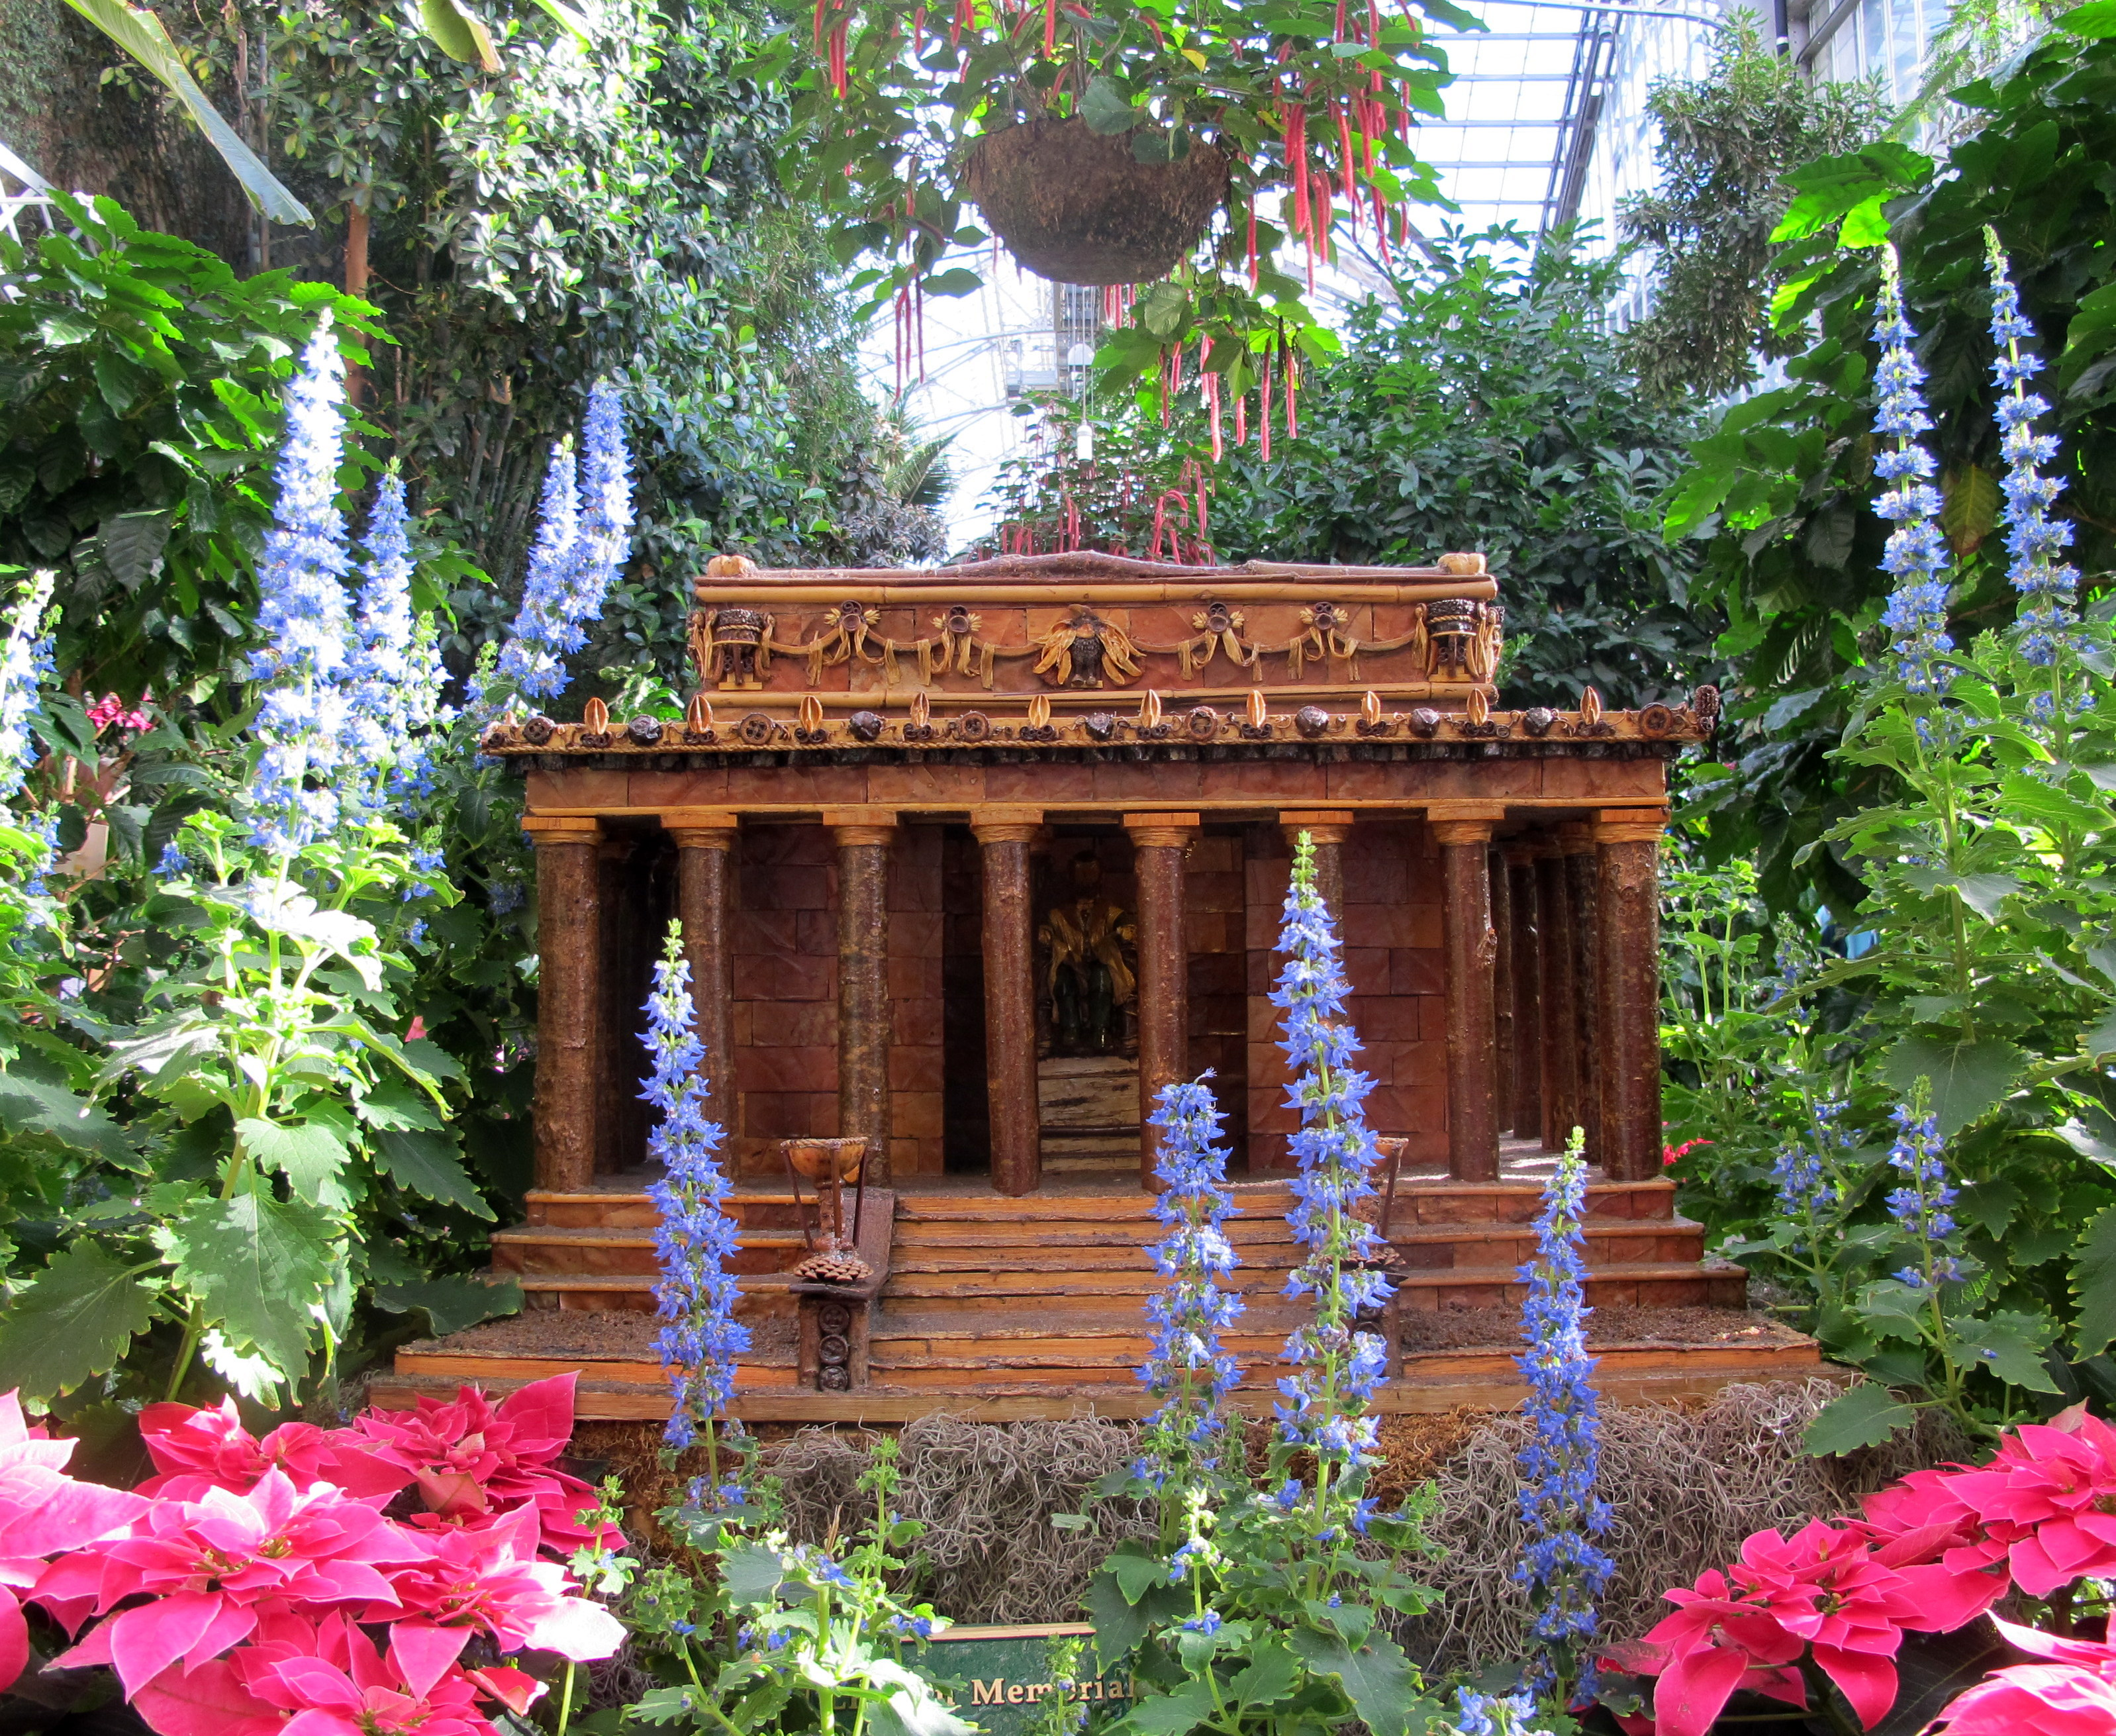 Botanic Garden in Washington DC Is A Slice of Paradise